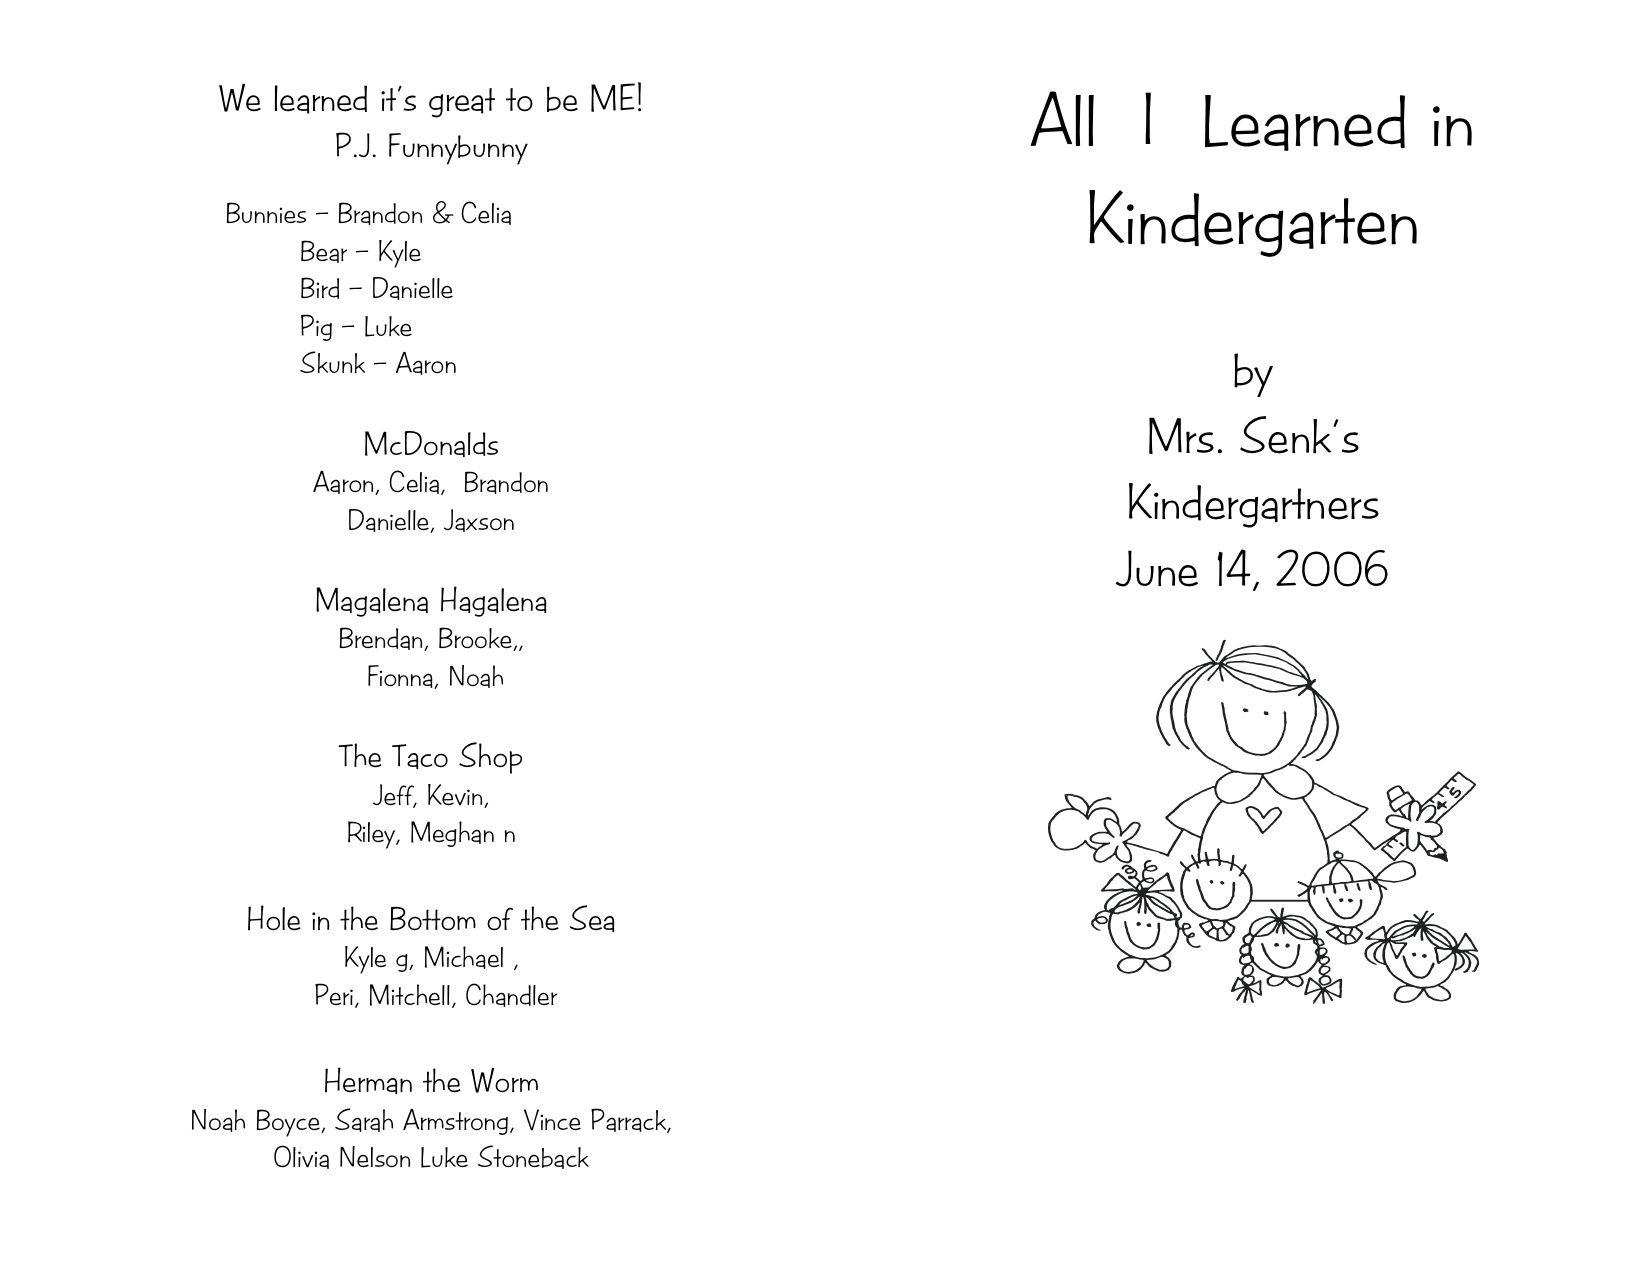 006 Remarkable Preschool Graduation Program Template High Def  Templates Free Printable PdfFull